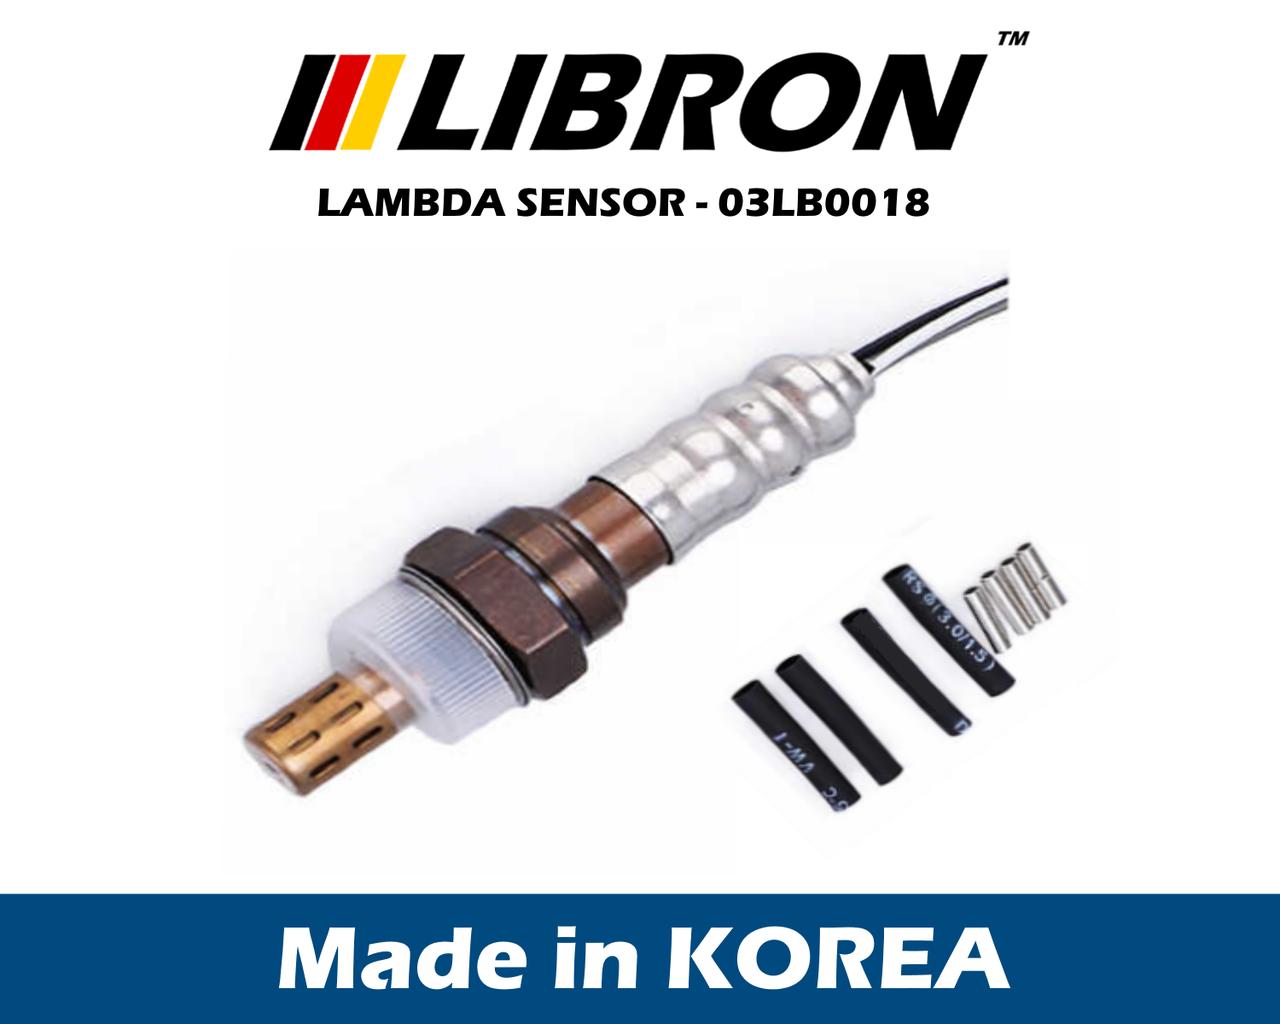 Лямбда зонд Libron 03LB0018 - Citroen SAXO (S0, S1)